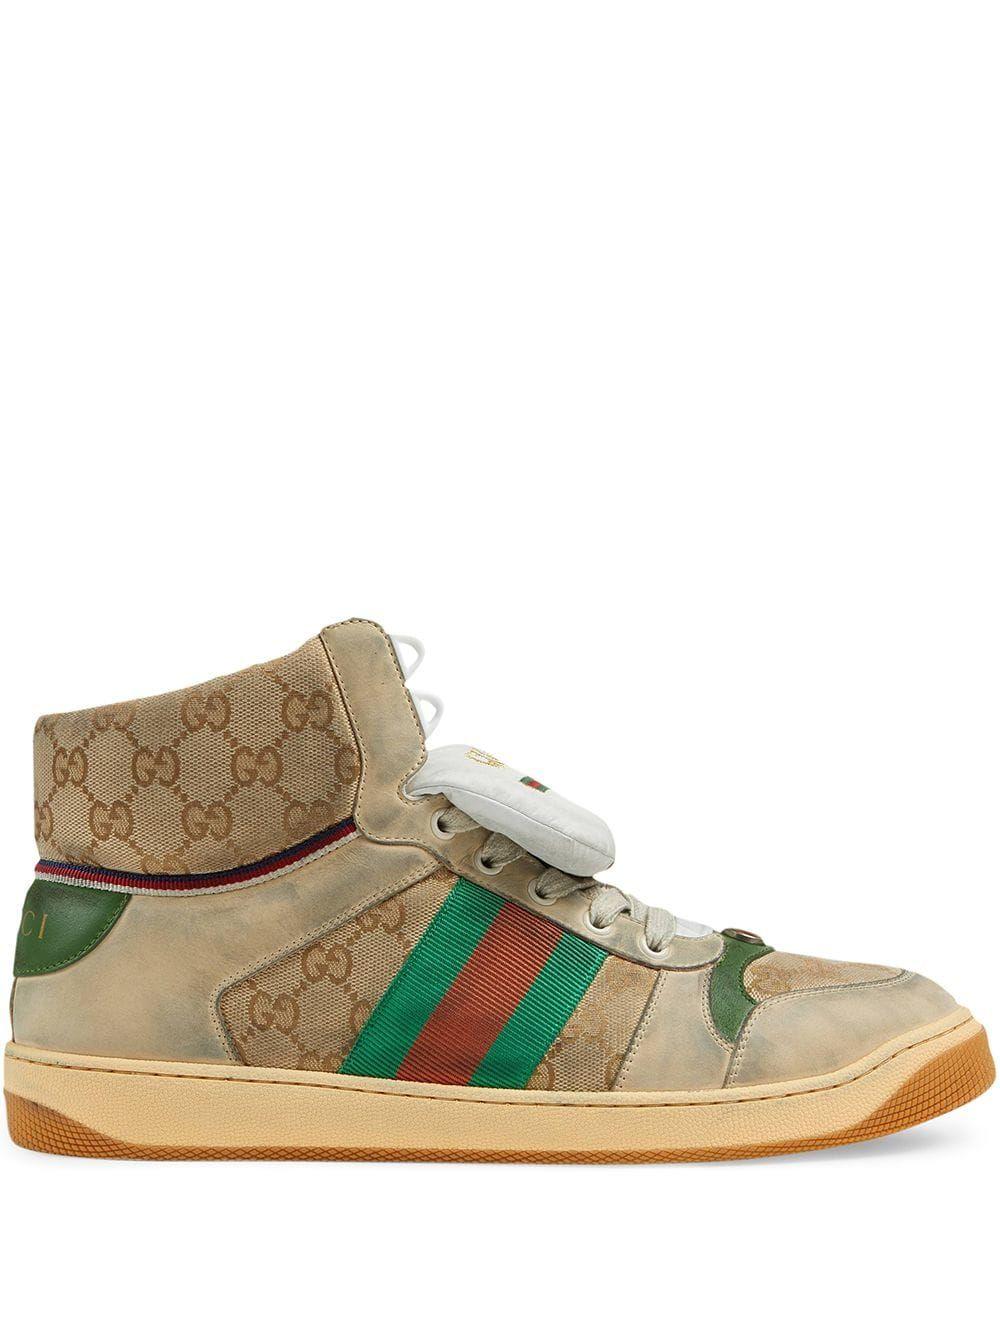 0830104f6d9 GUCCI GUCCI MEN S SCREENER GG HIGH-TOP SNEAKER - WHITE.  gucci  shoes